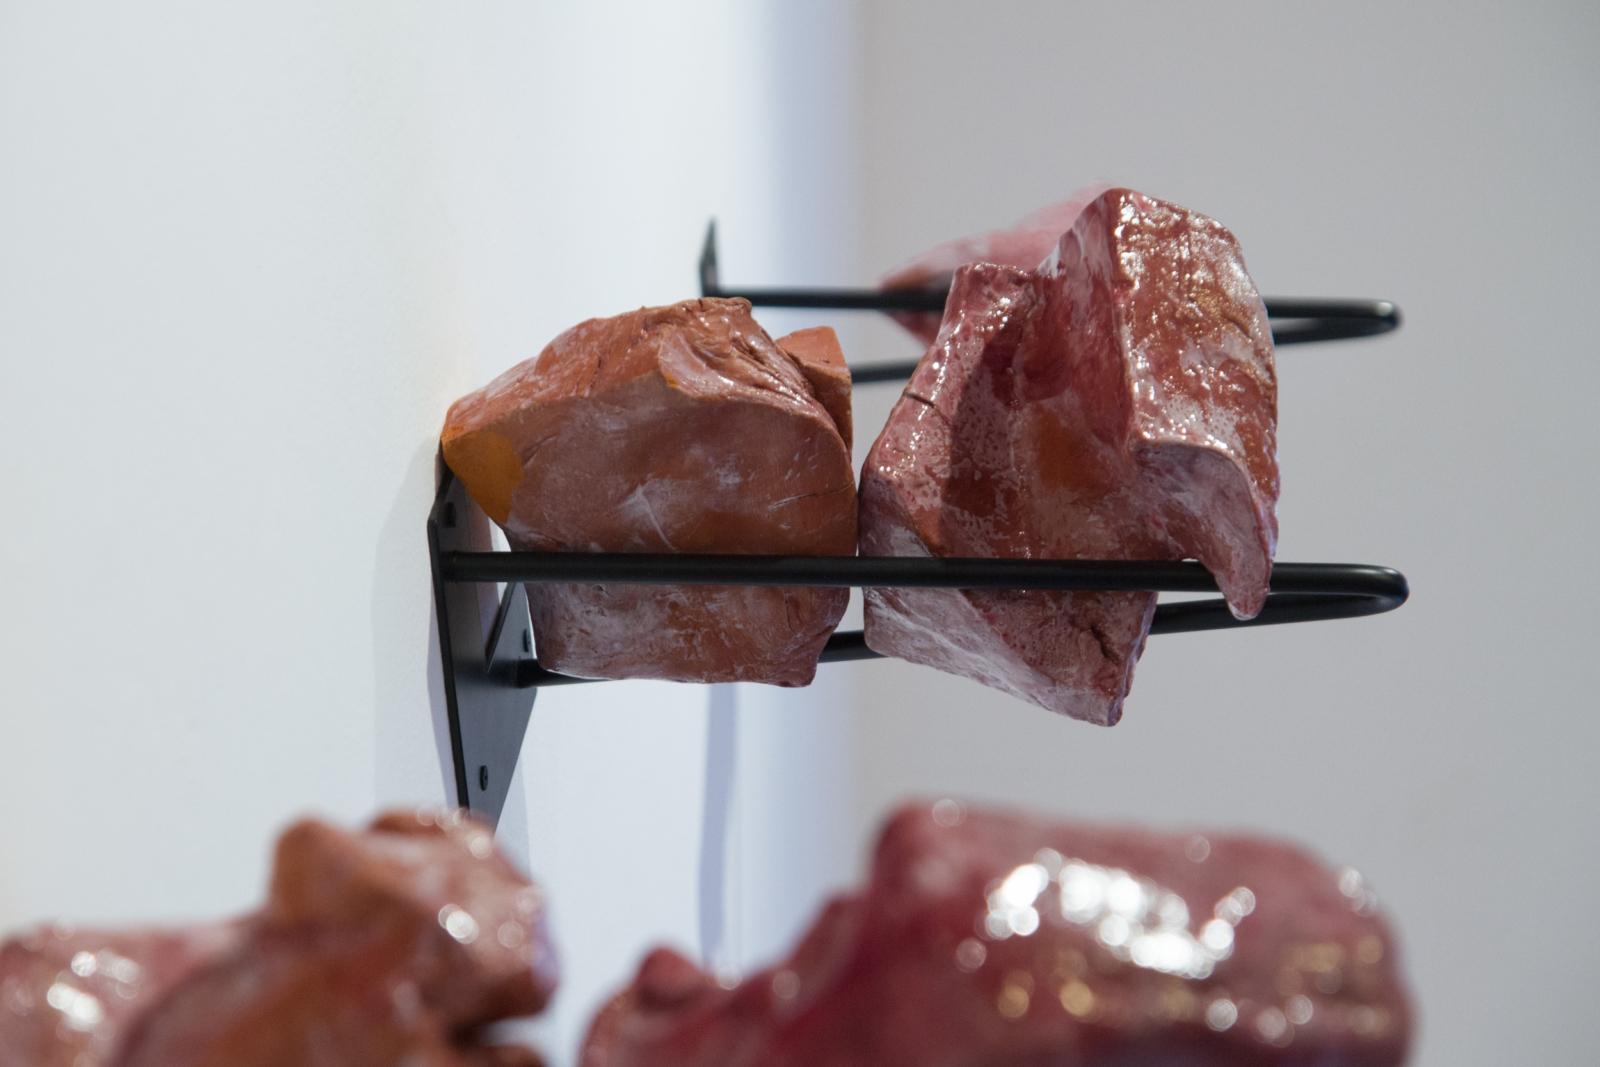 Clay Body Protocol, ceramic sculptures, size variable; about 10 cm x 10 cm x 10 cm/ element, 2019.